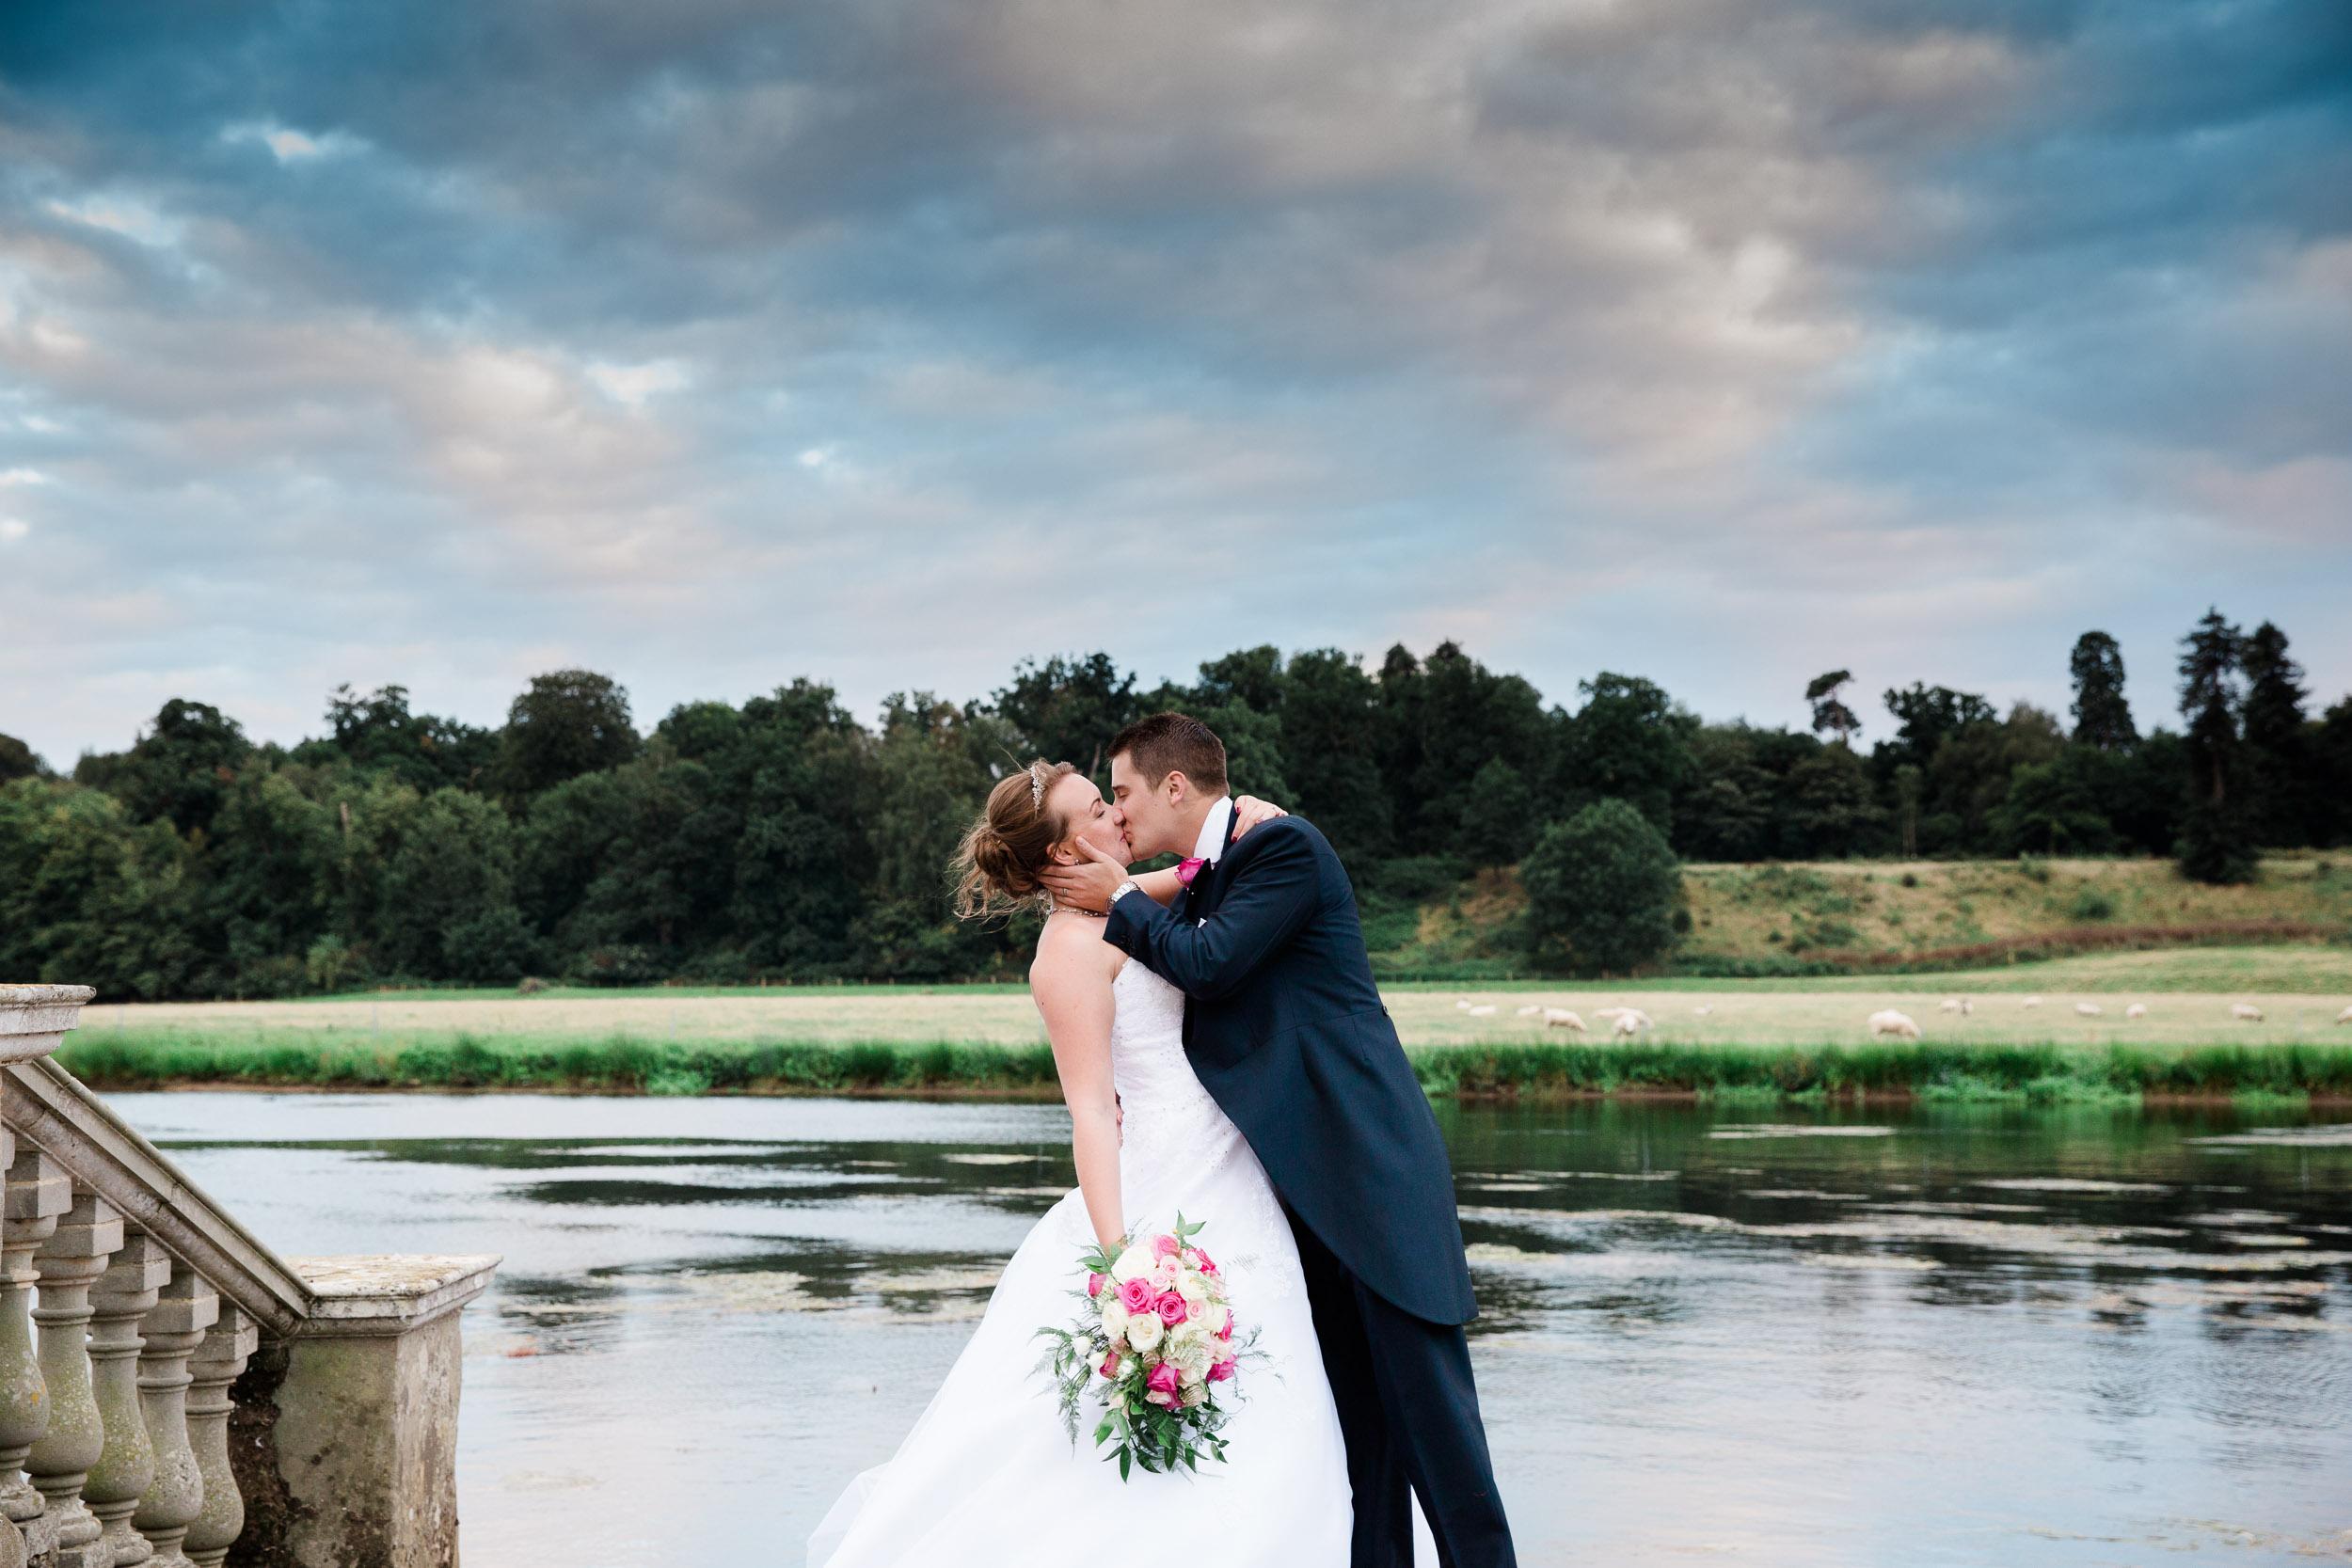 stoneleigh-abbey-wedding-photography-78